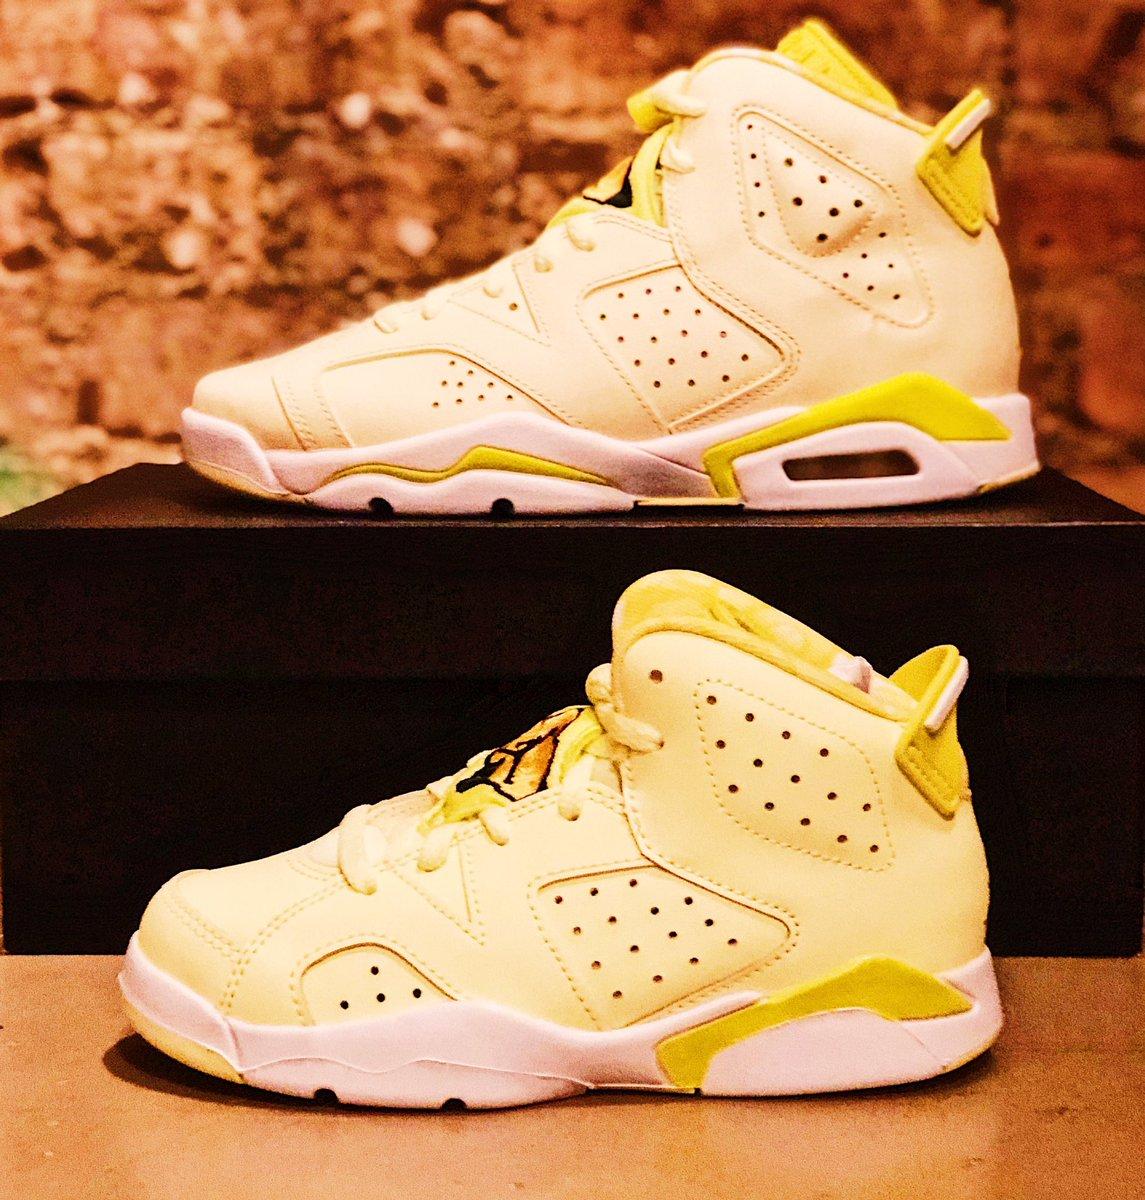 Jordan 6 Retro Dynamic Yellow Floral (GA) release today @NBASTORE NYC!